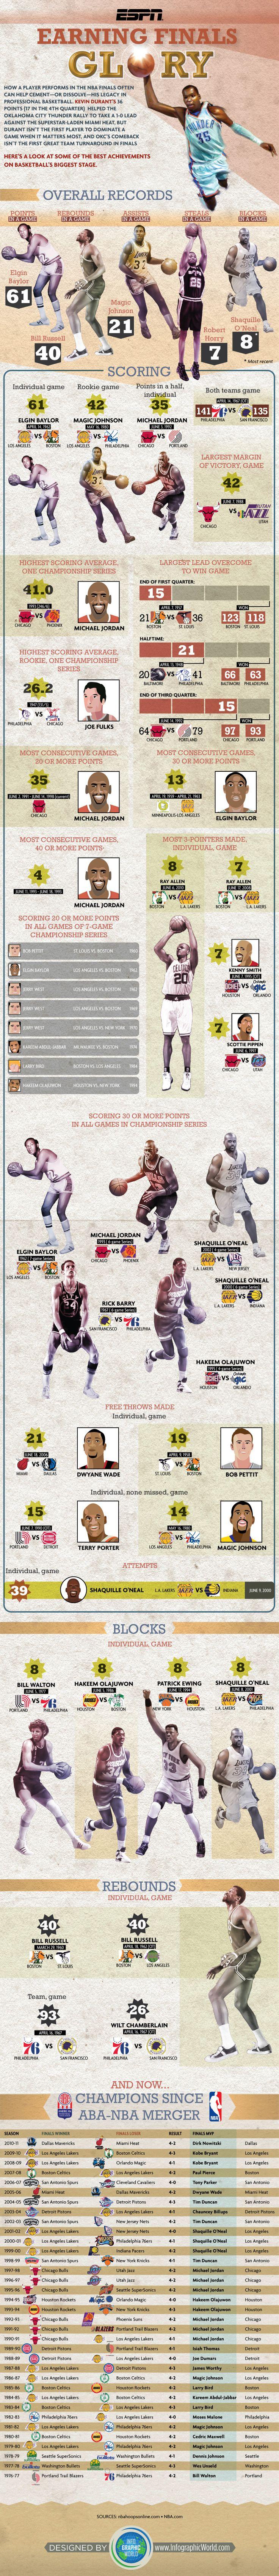 ESPN Infographic: NBA Finals Most Epic Performances